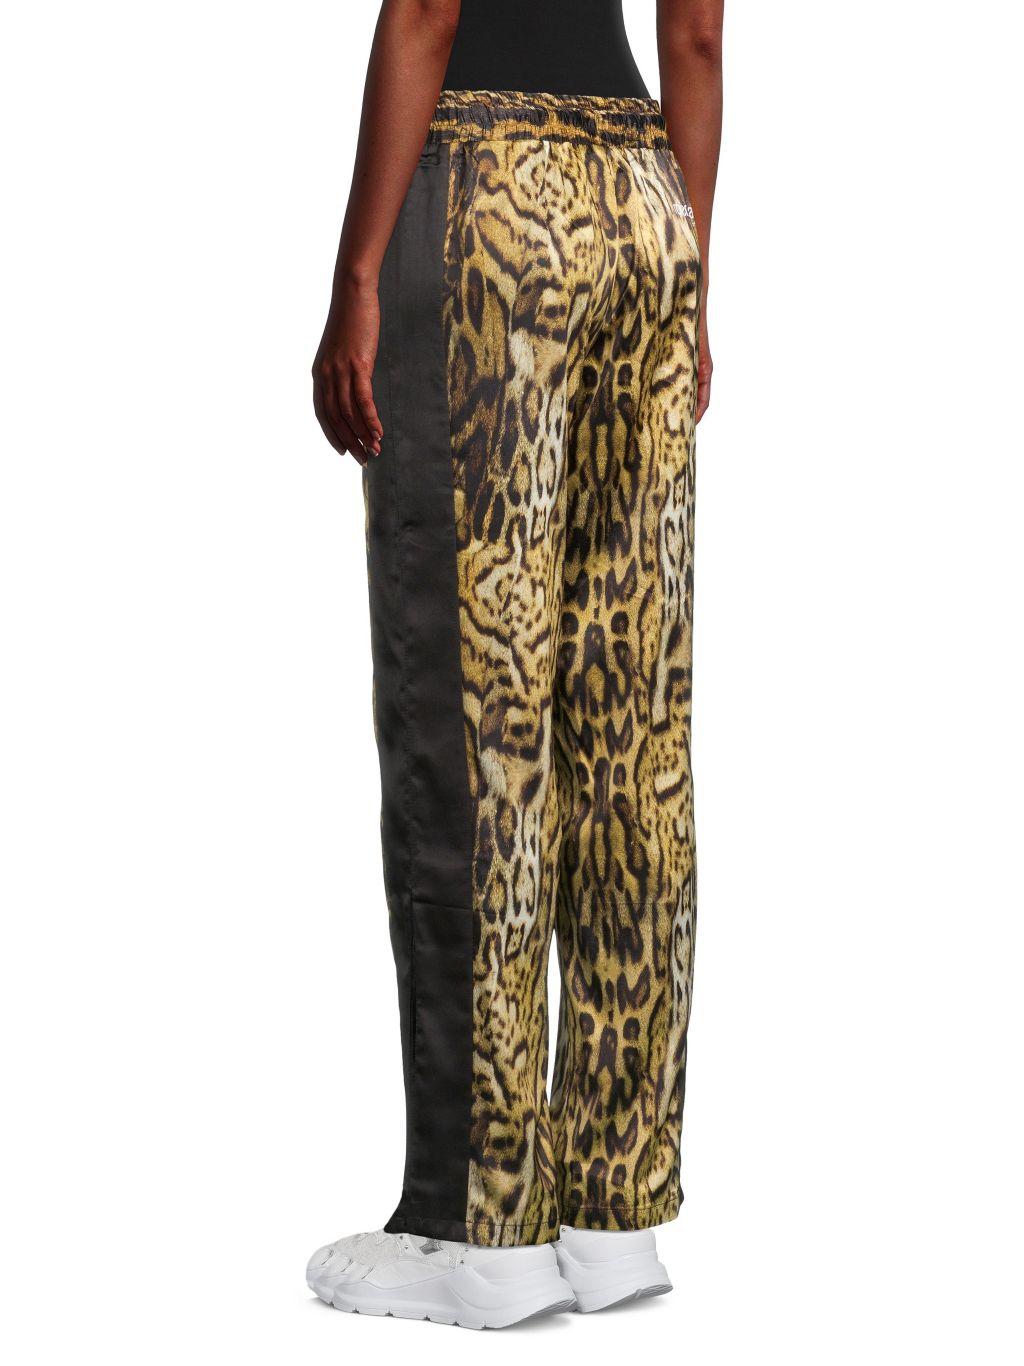 Roberto cavalli SPORT Leopard-Print Track Pants